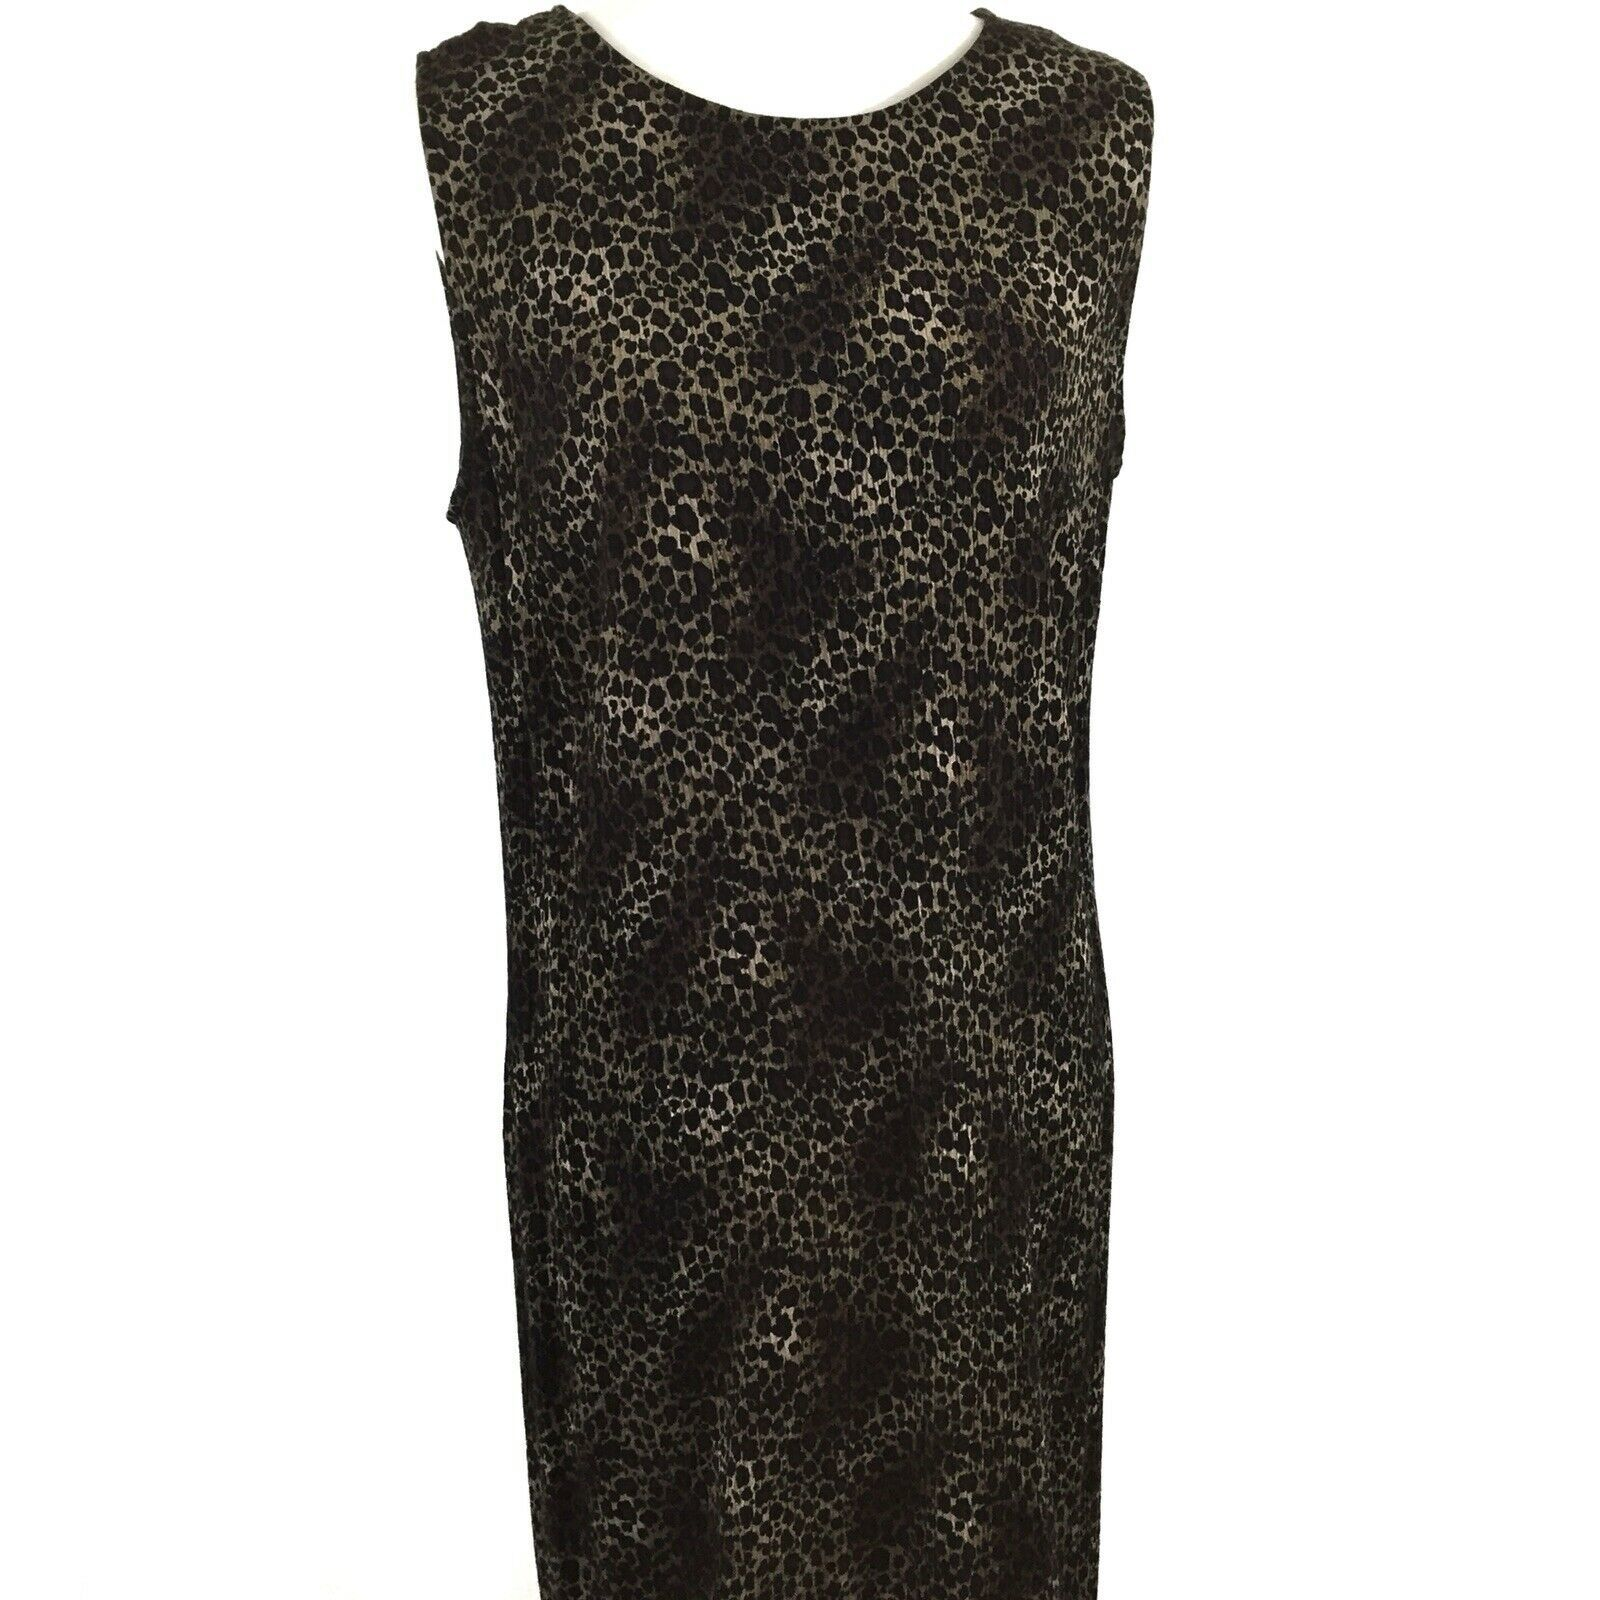 KSL Karin Stevens Sleeveless Maxi Dress and Jacket Size 14W Brown Animal Print image 8